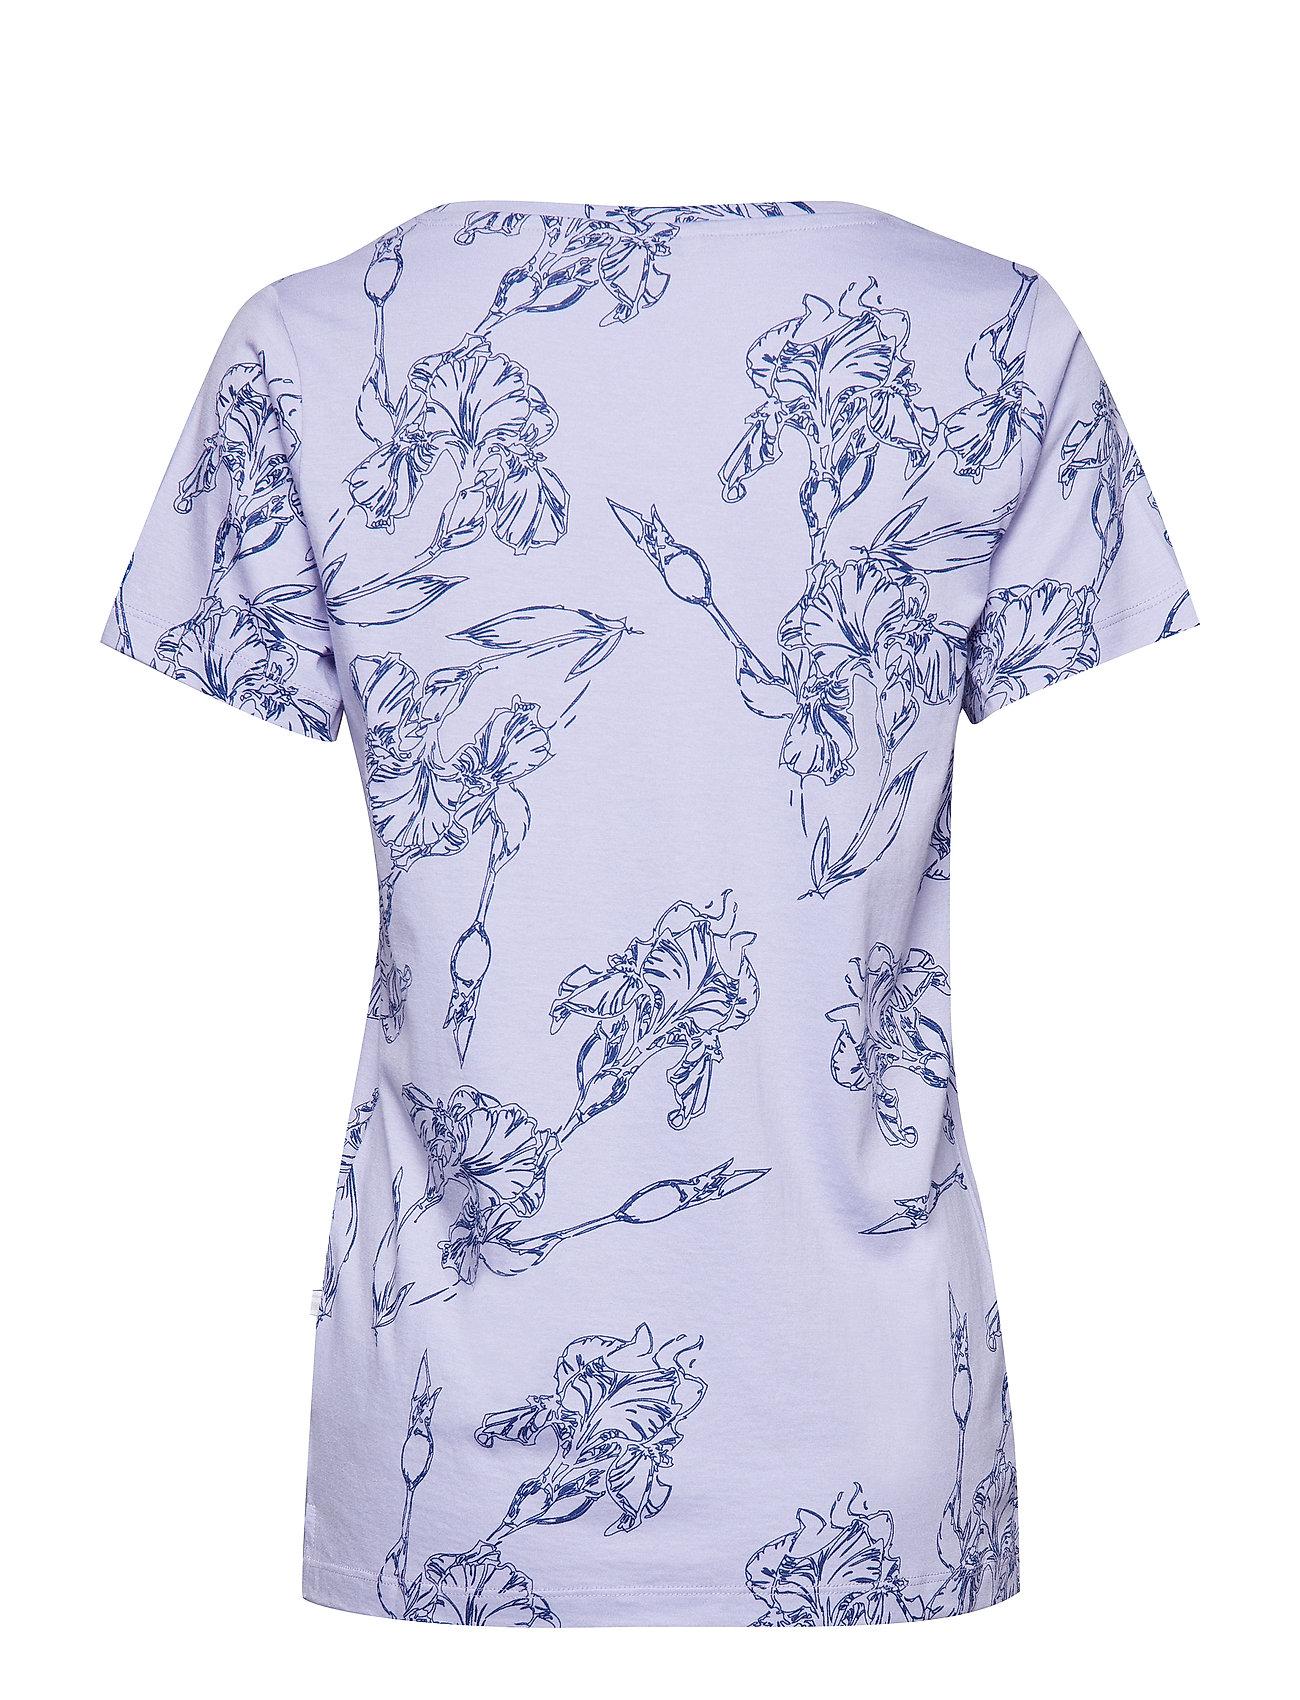 T ShirtTop T shirt Top SIGNAL